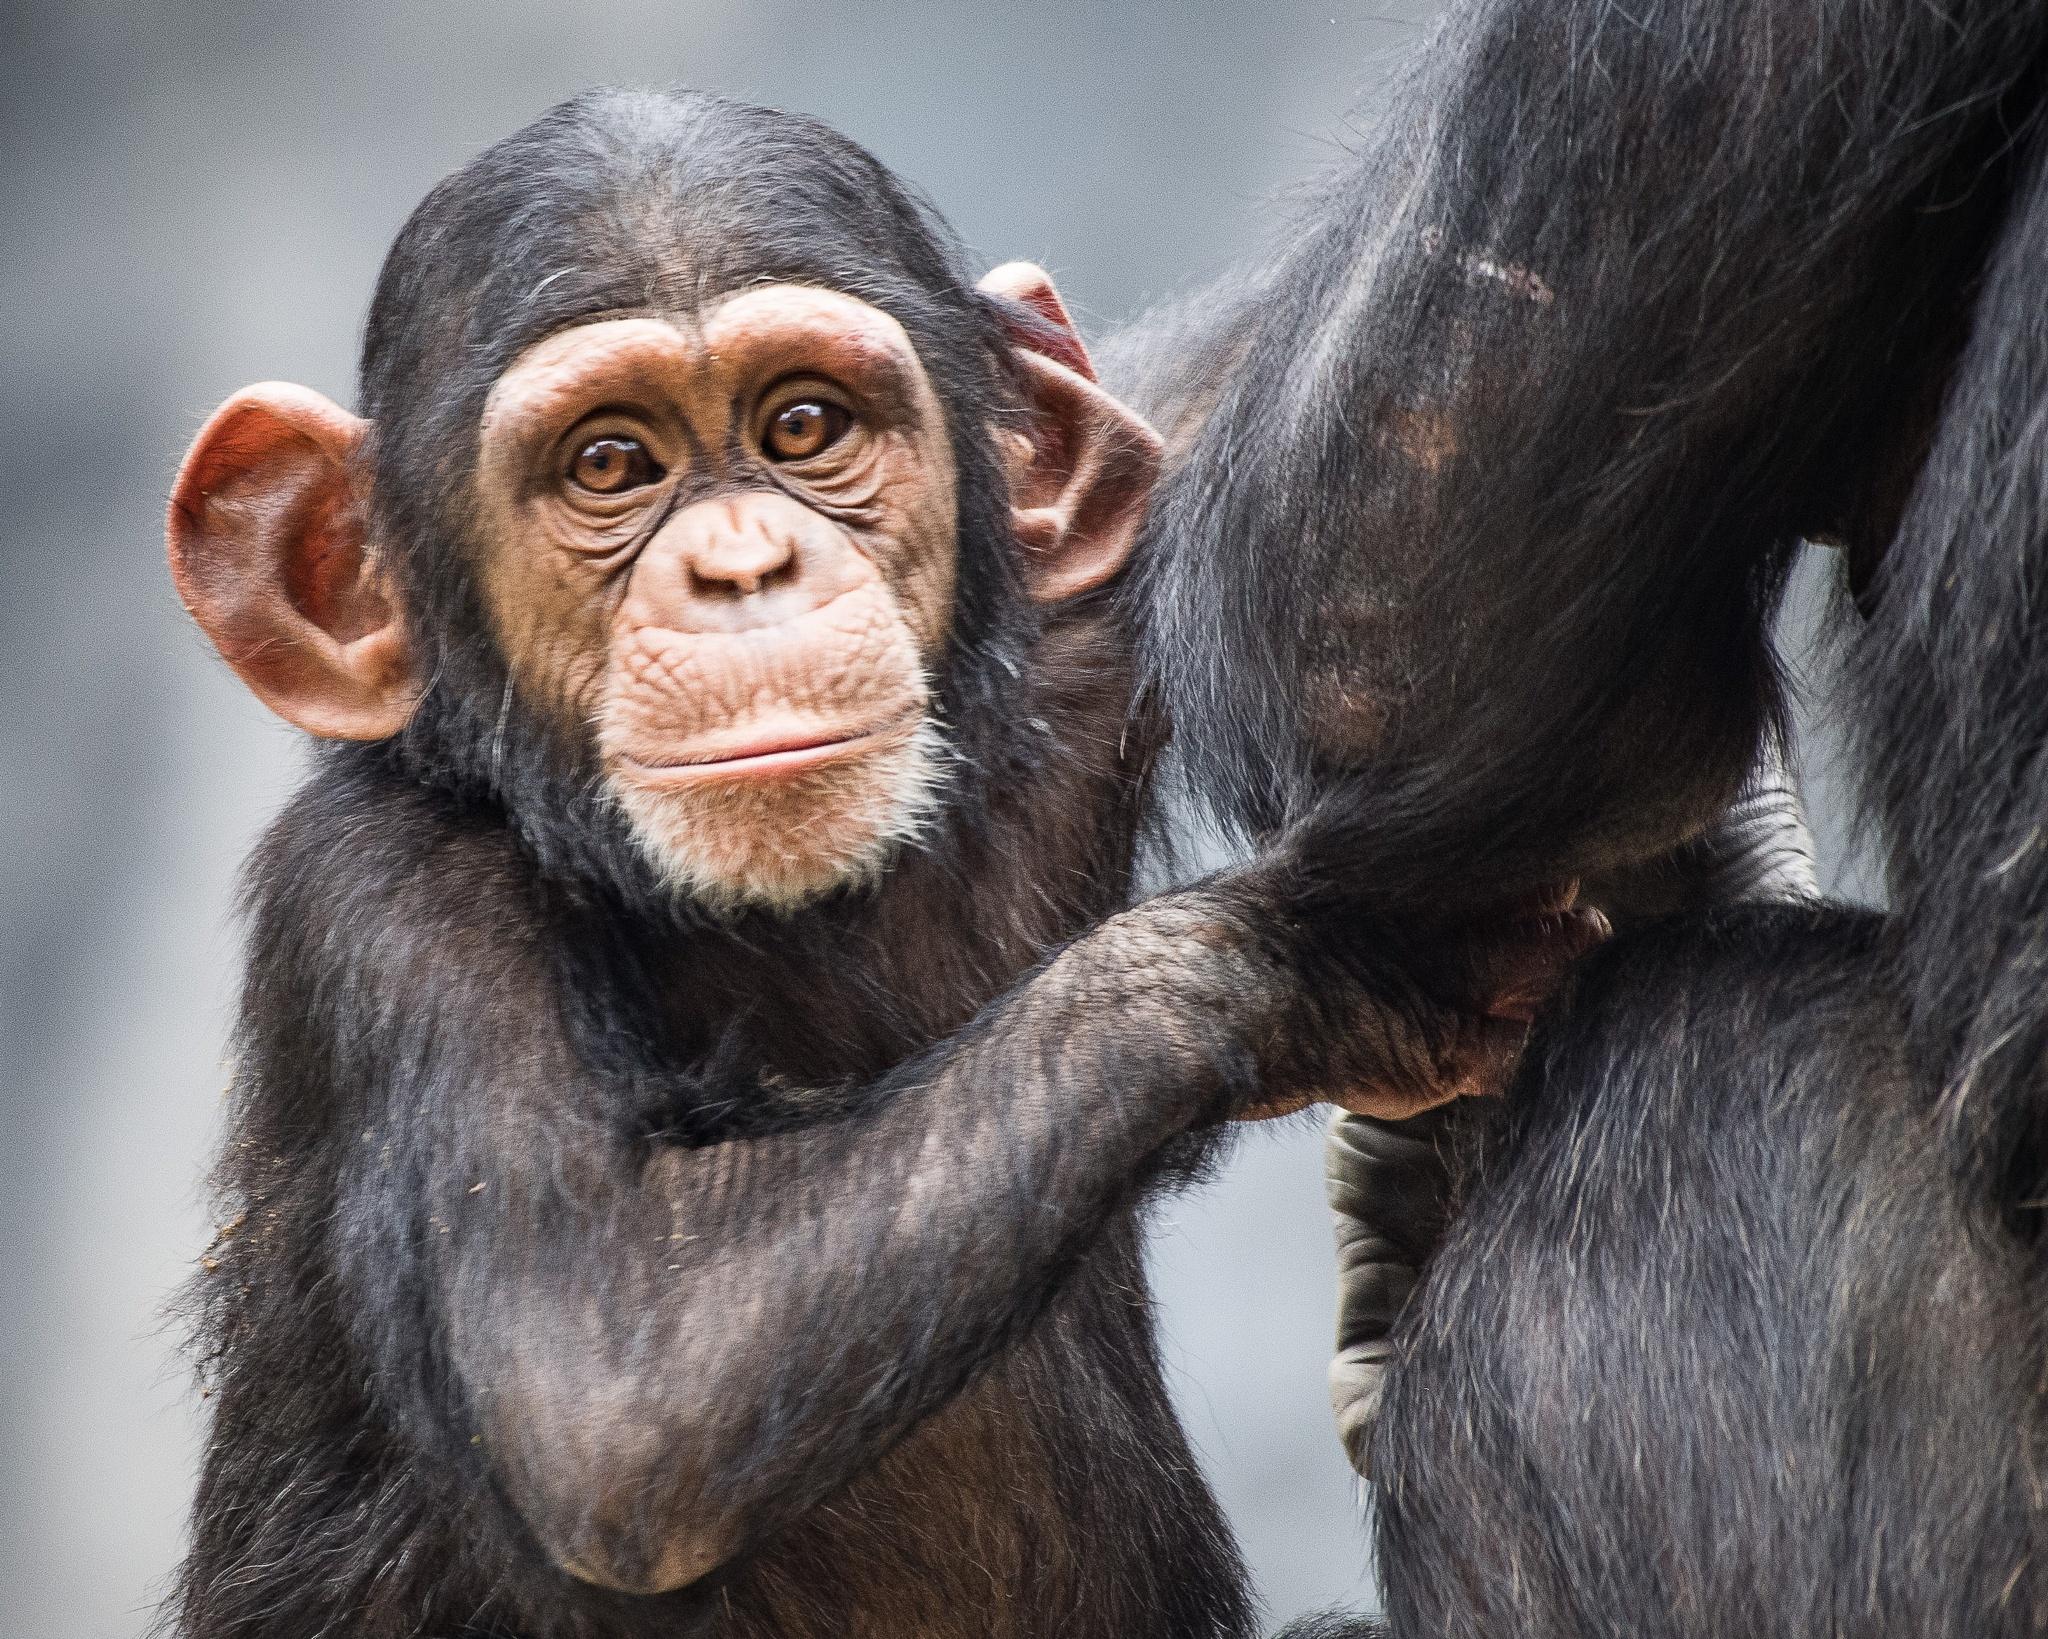 Baby Chimp by Steve Aicinena